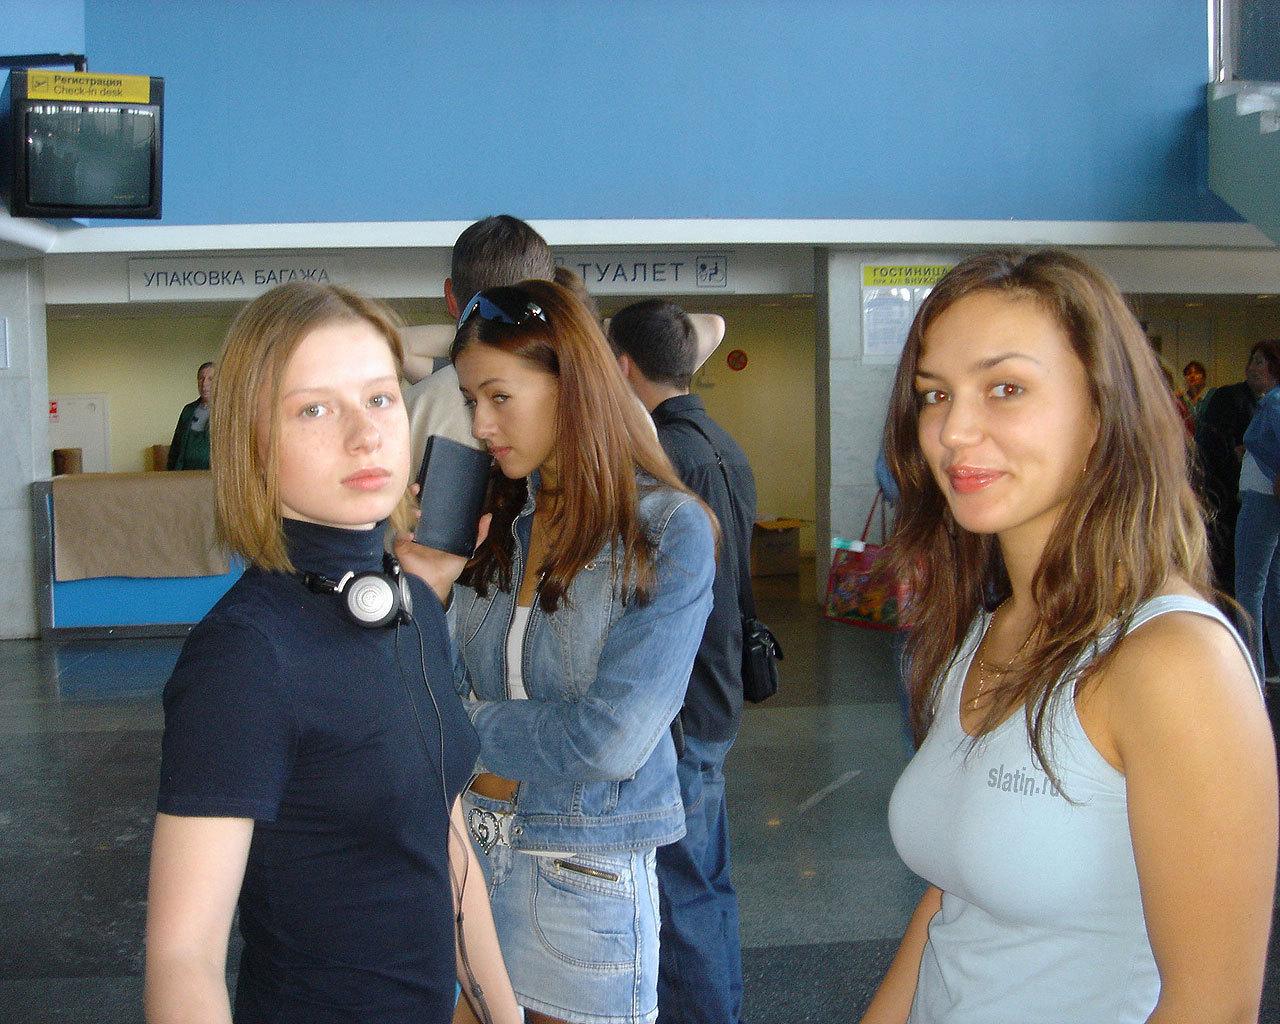 Elena Berezhnaya is getting married on 09/14/2009